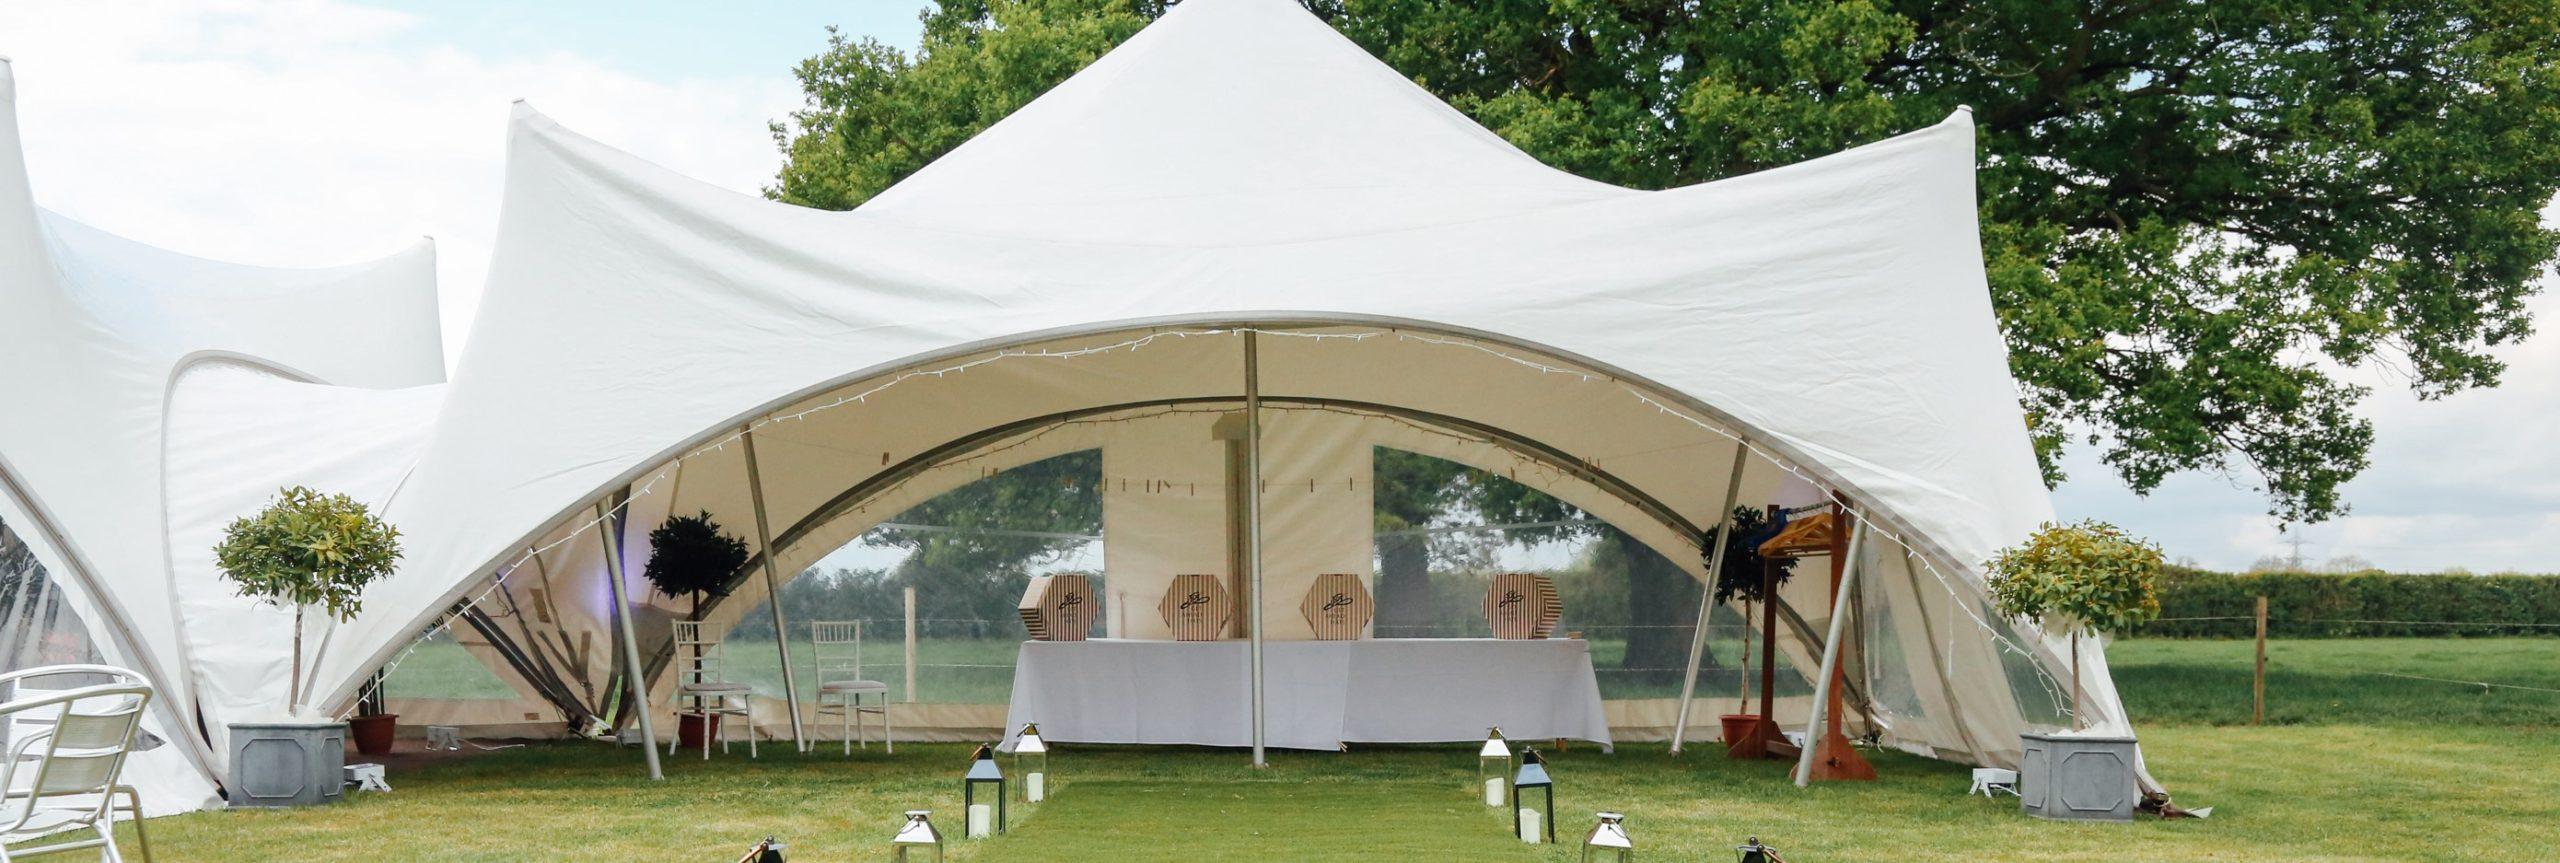 Oak tree farm wedding venue marquee